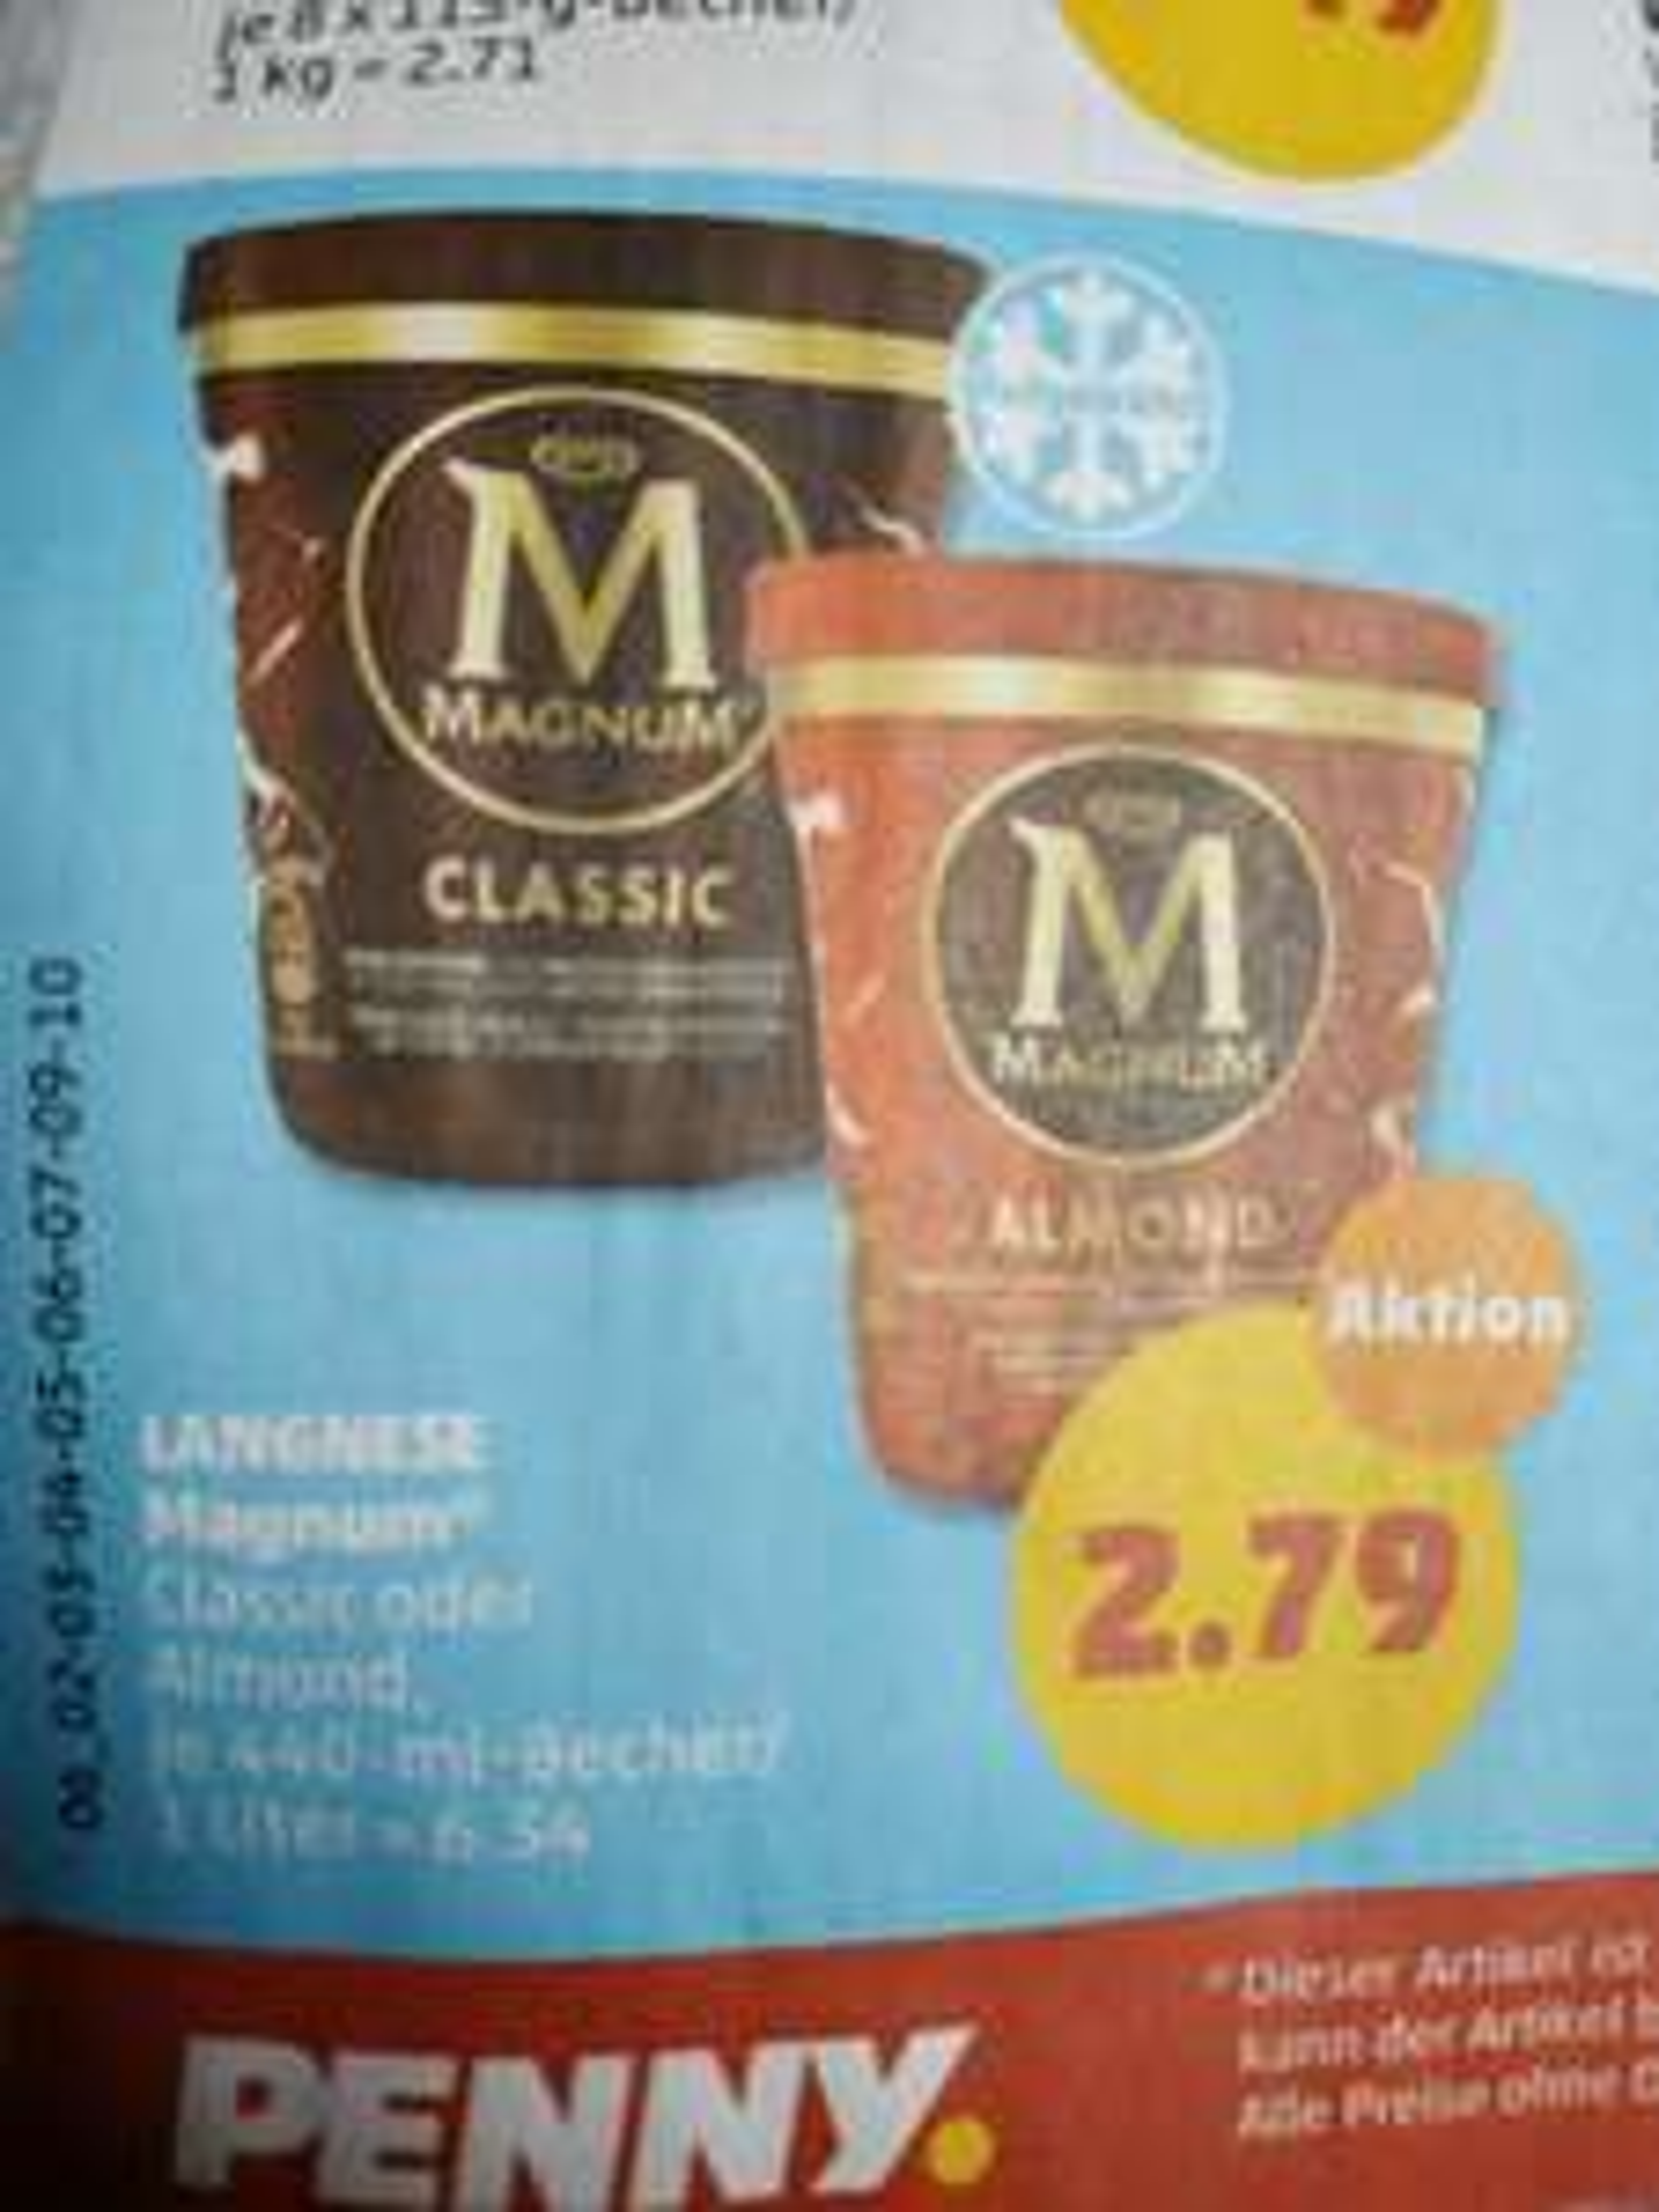 [Penny] Ab 12.11.: Magnum Eisbecher Classic und Mandel je 2,79€